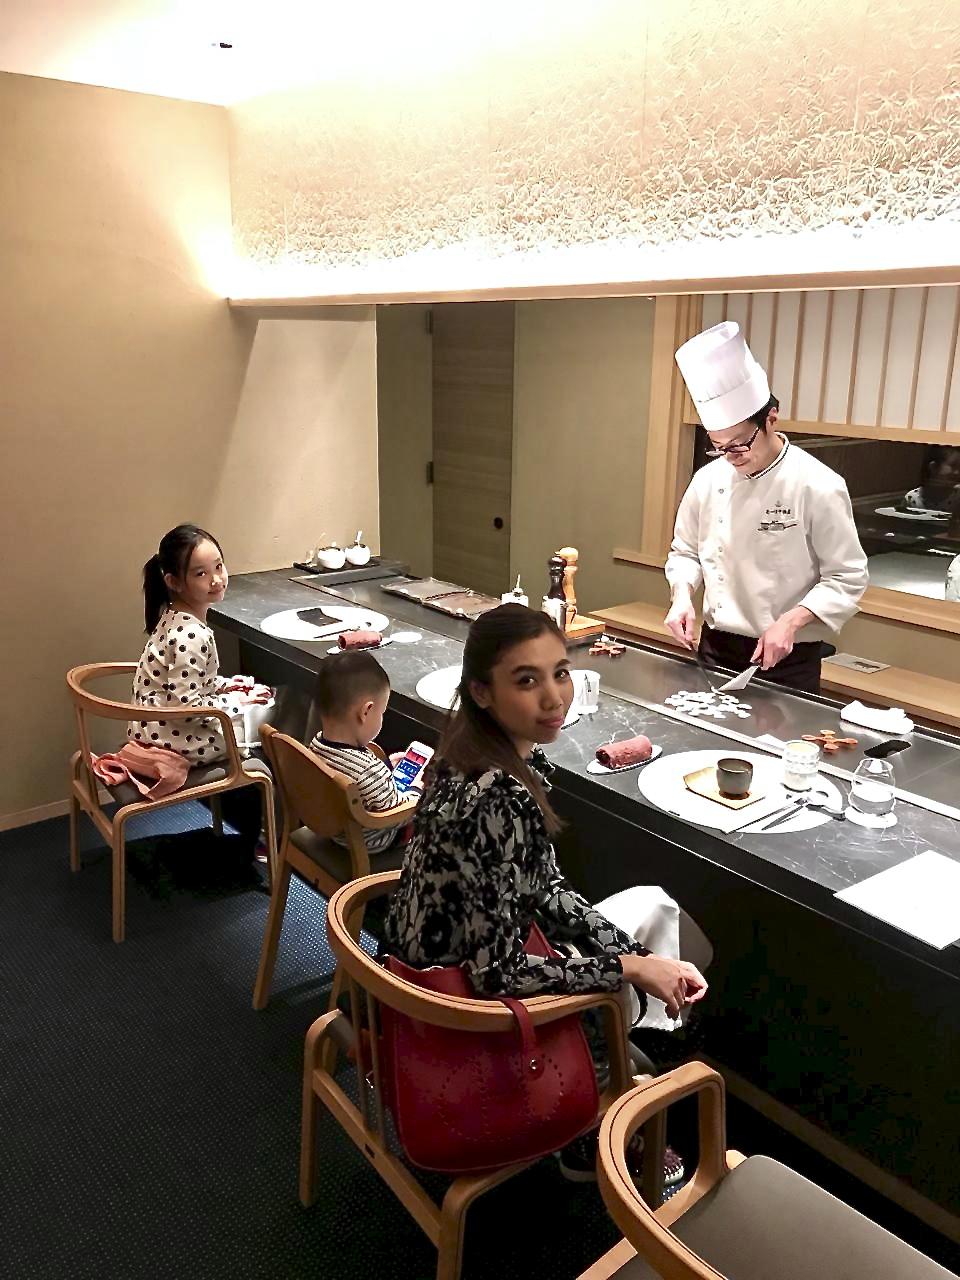 Dinner at Mouriya Gion, Kyoto